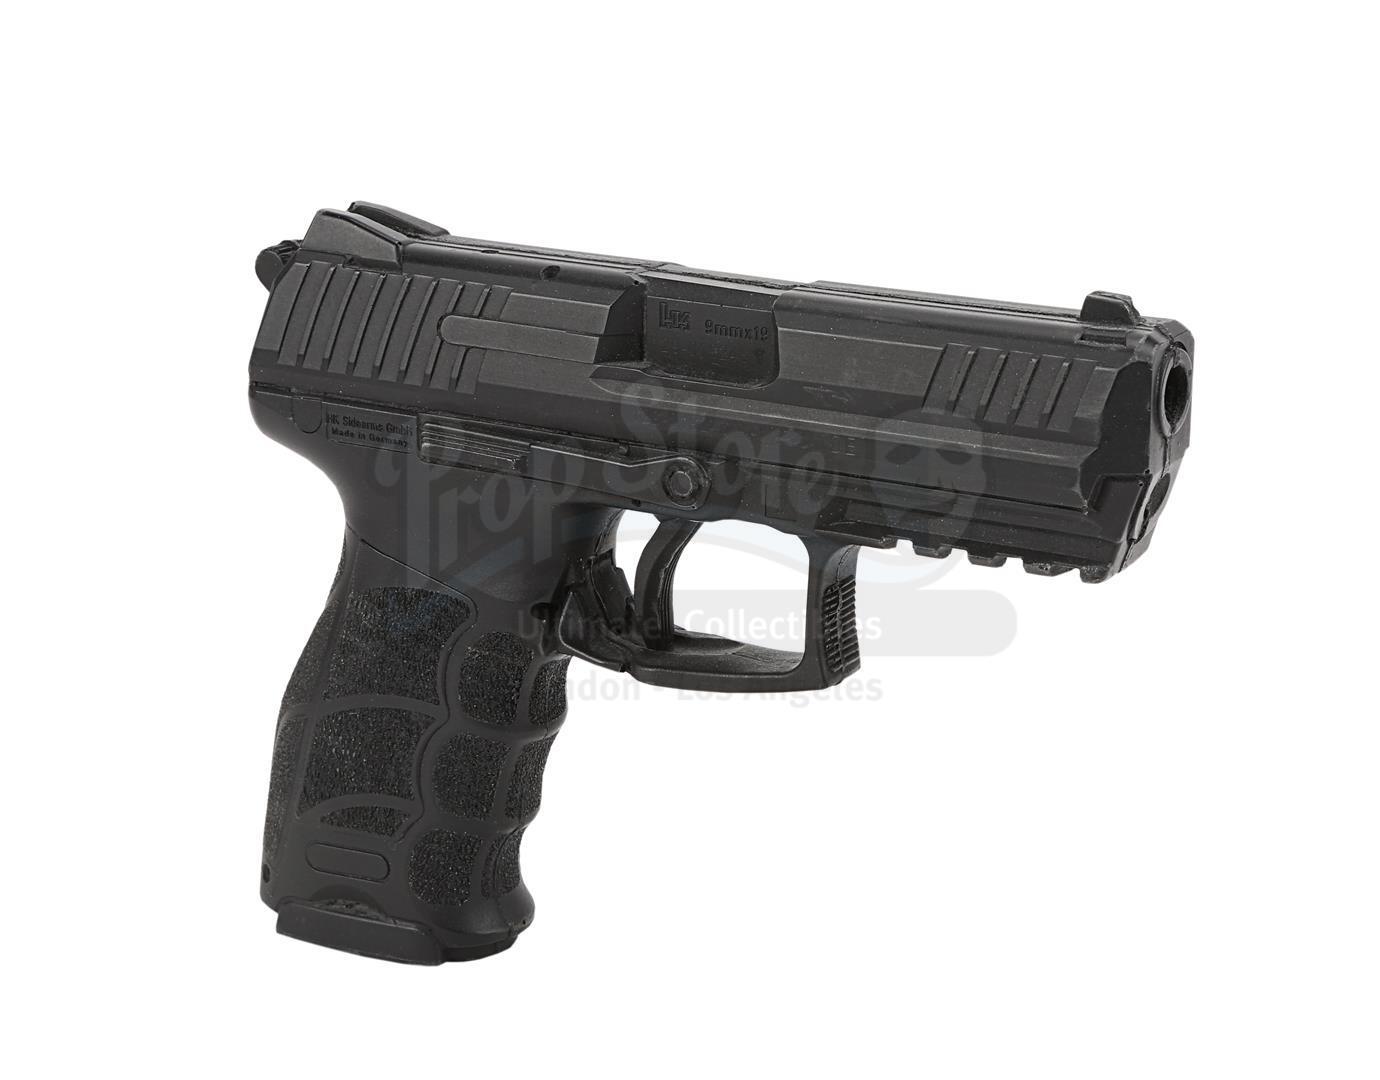 THE AVENGERS (2012) - Hawkeye's (Jeremy Renner) H&K P30 Stunt Pistol